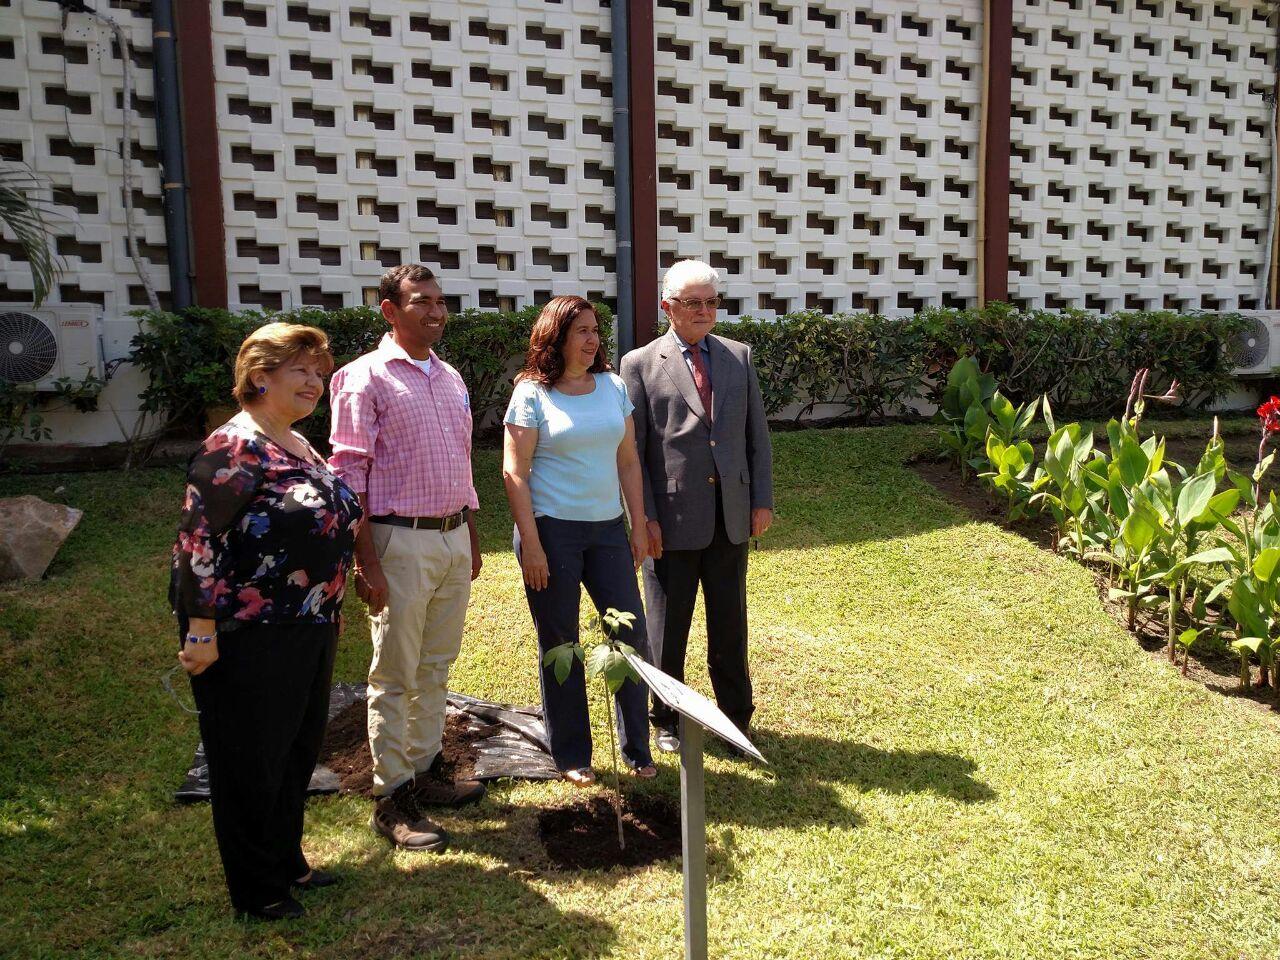 Saturday morning Vishnu planted a tree sapling  with Environment Minister of El Salvador Leen Pohl.